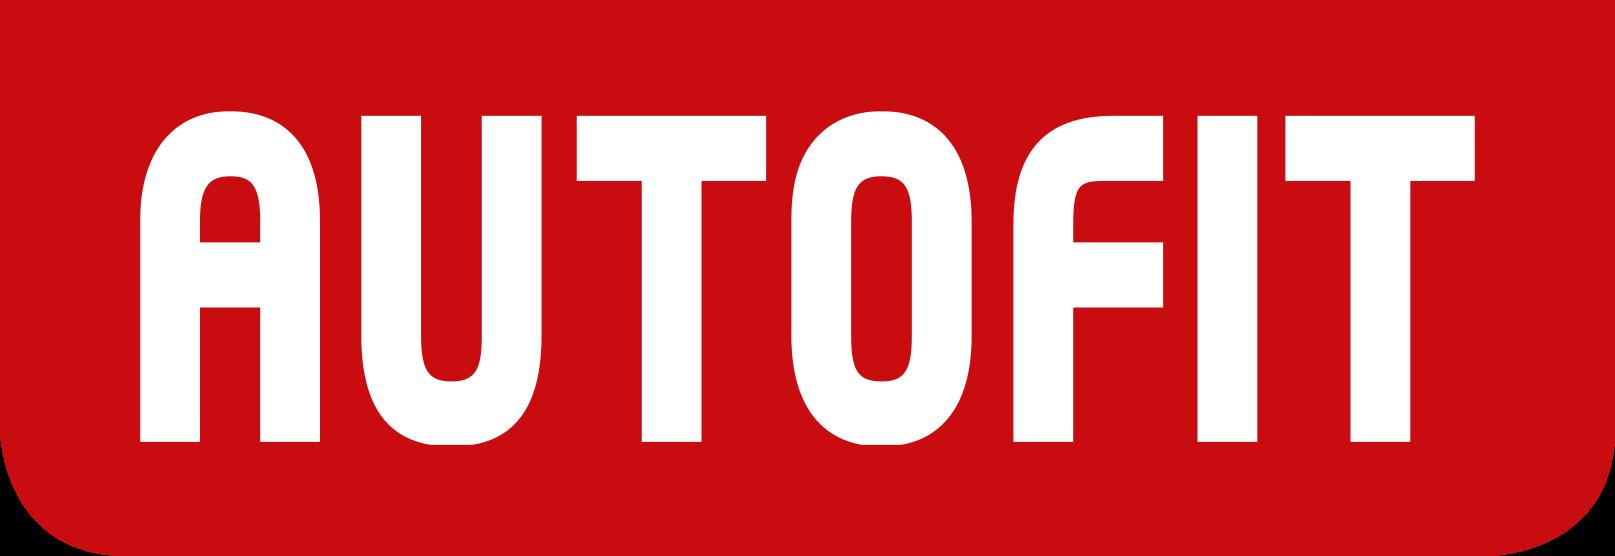 Autofit-Rauer logo